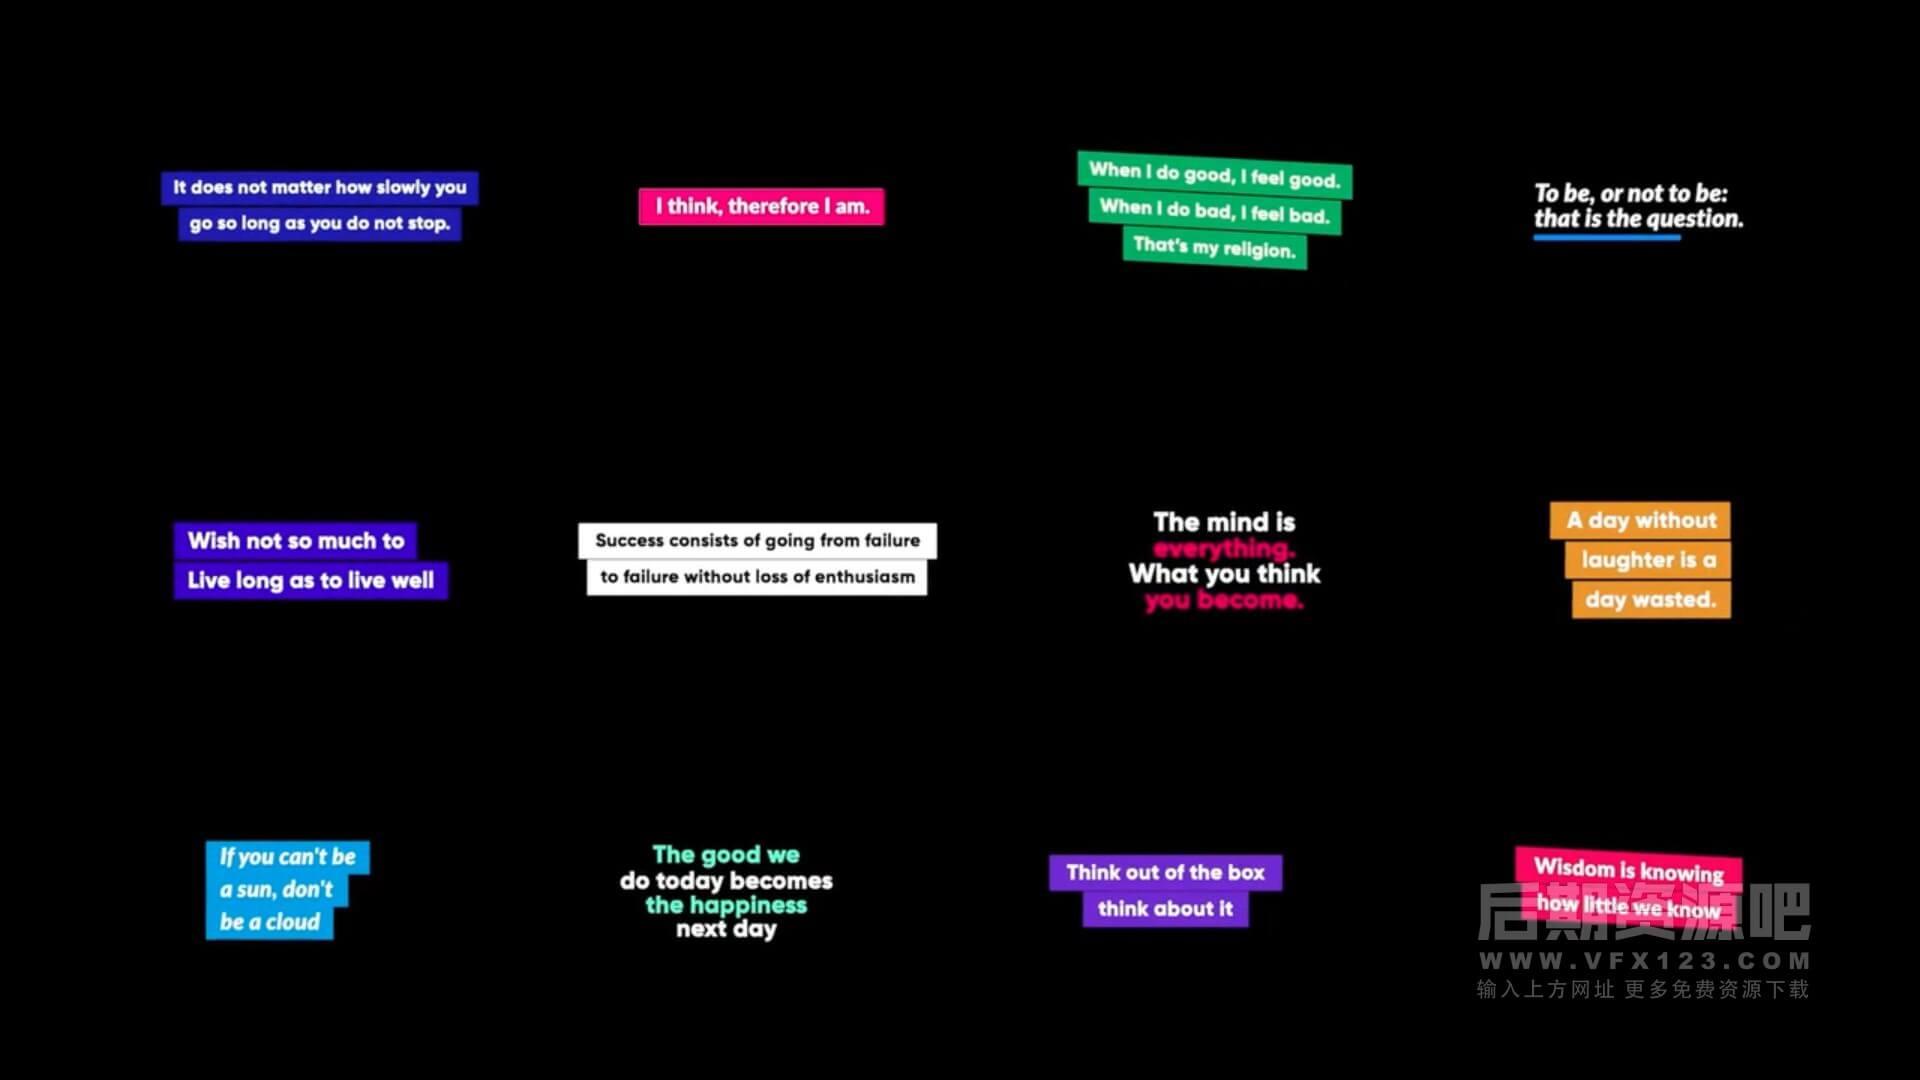 fcpx标题插件 12组社交媒体对话多行文字动画预设 Social Titles